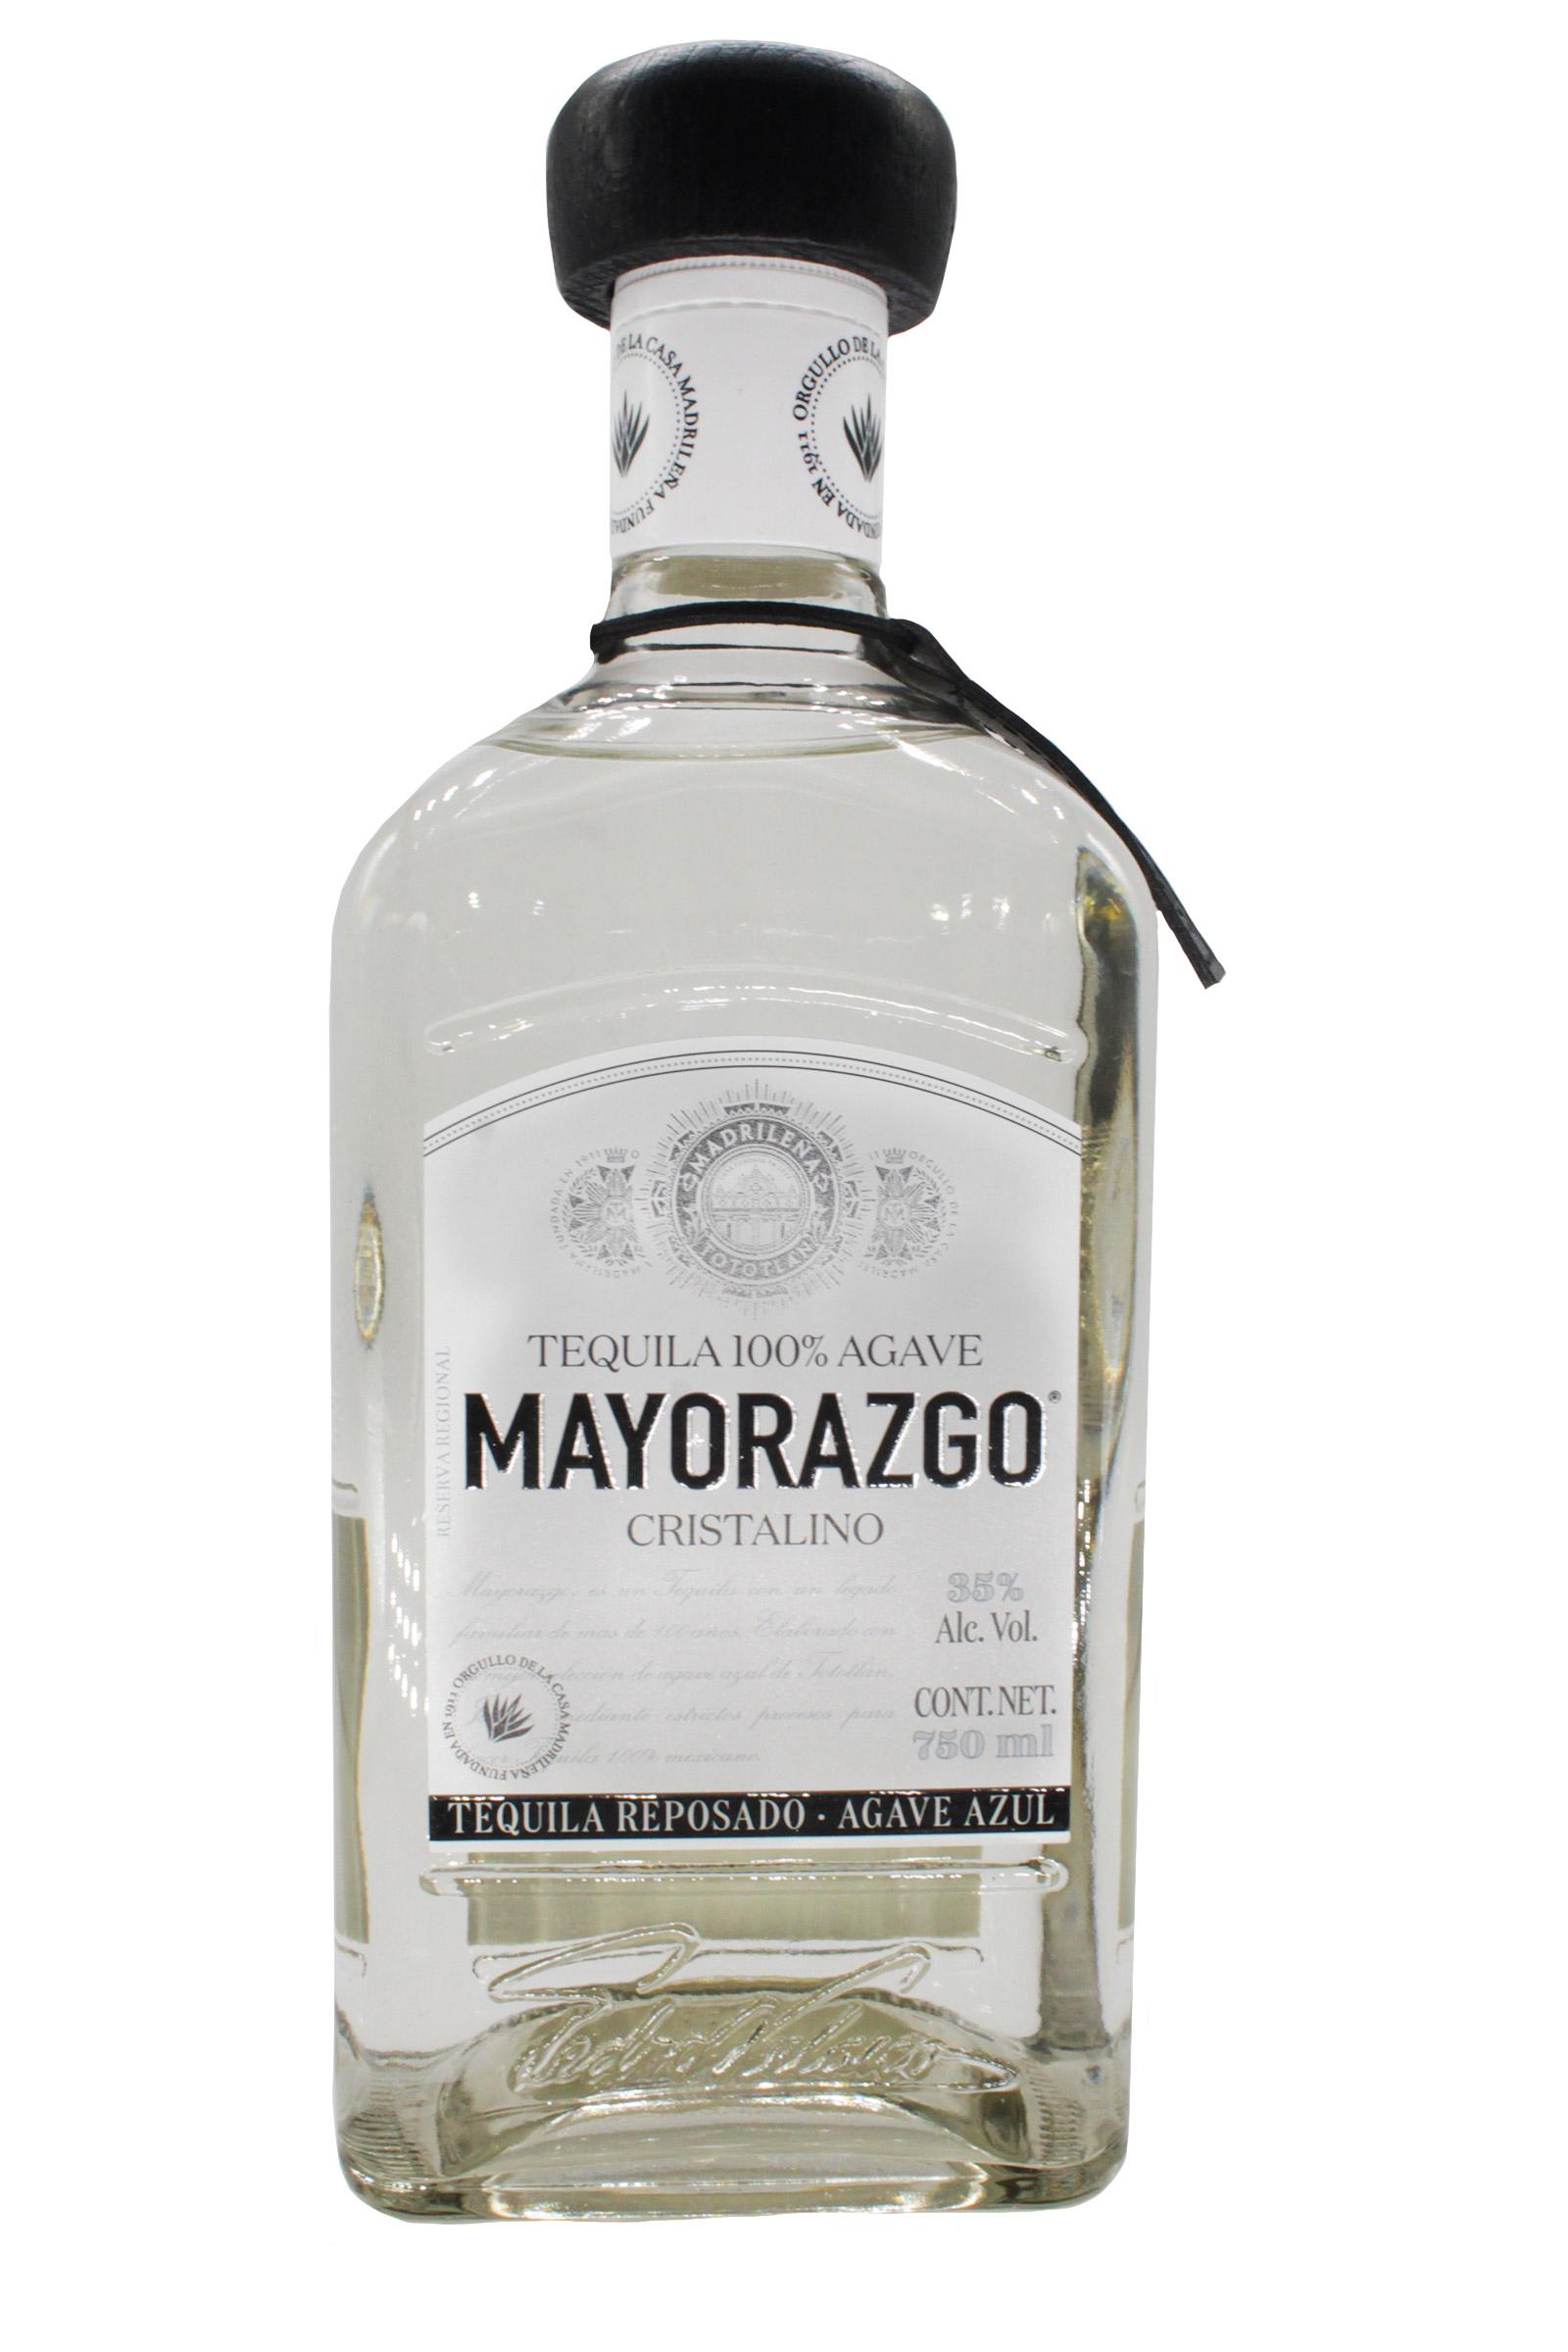 Tequila Mayorazgo Reposado Cristalino 100% Agave 750ml